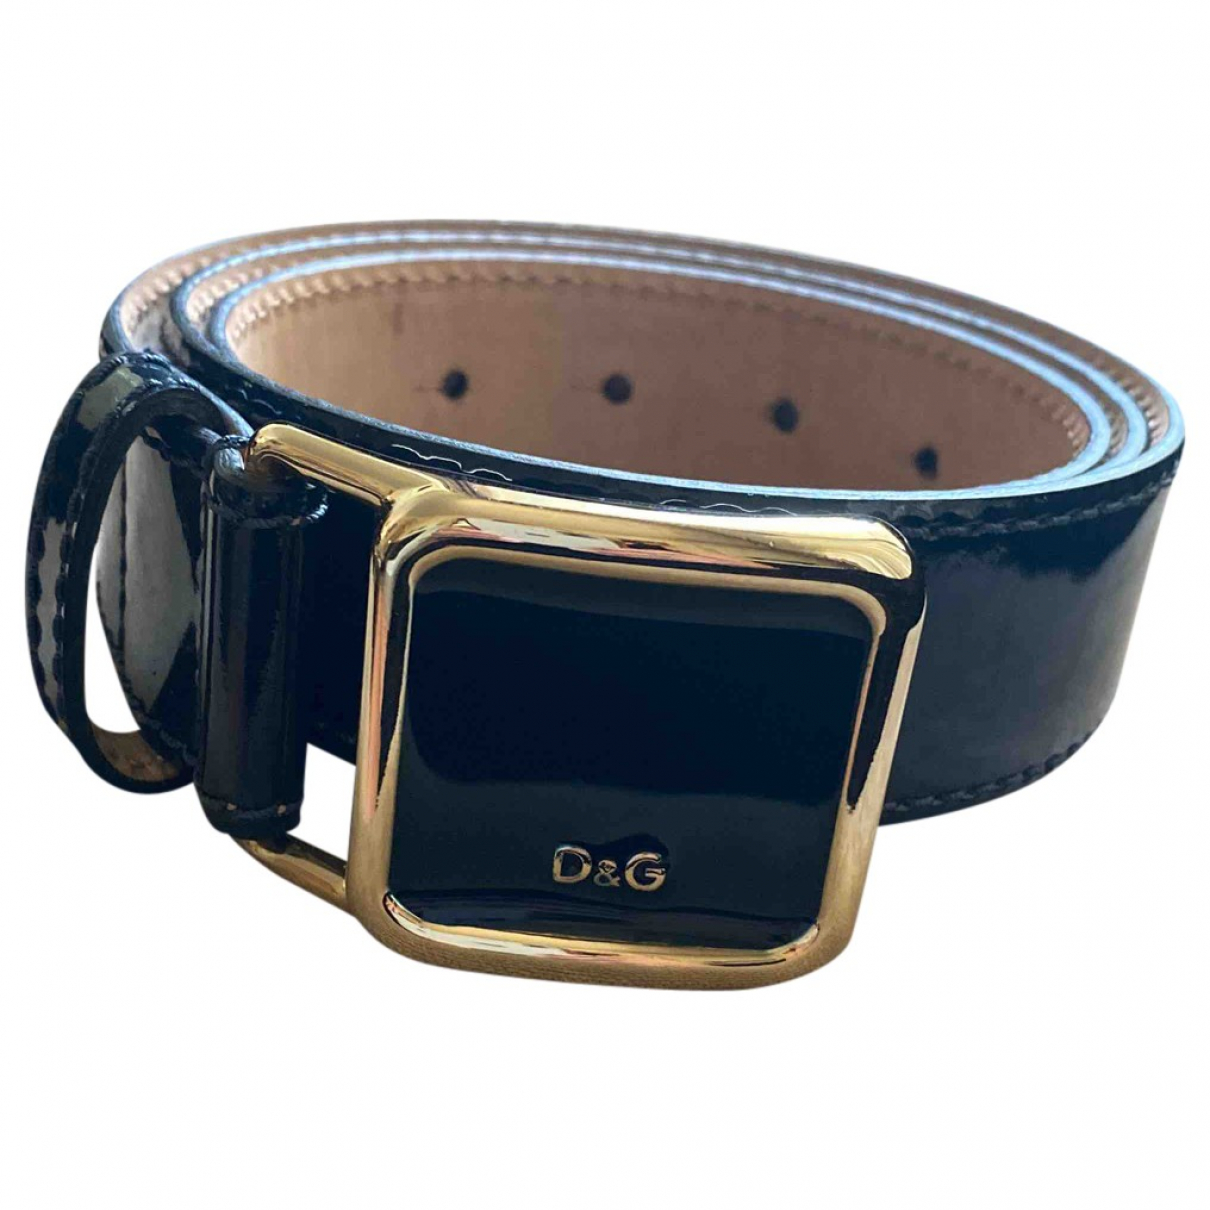 D&g \N Navy Patent leather belt for Women 90 cm